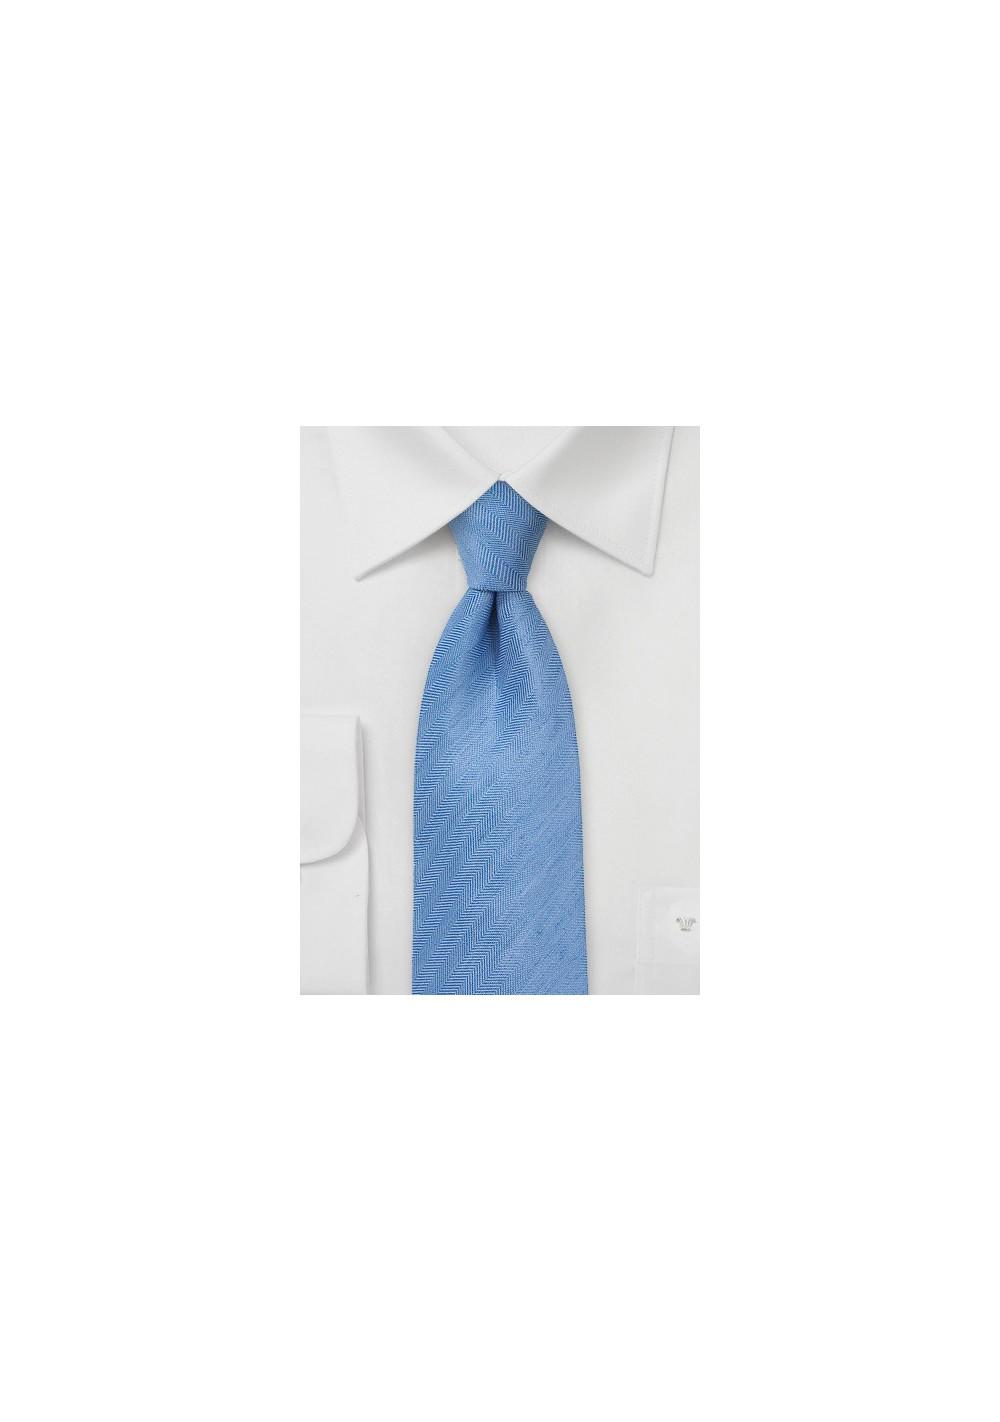 Woven Herringbone Linen Tie in Light Blue